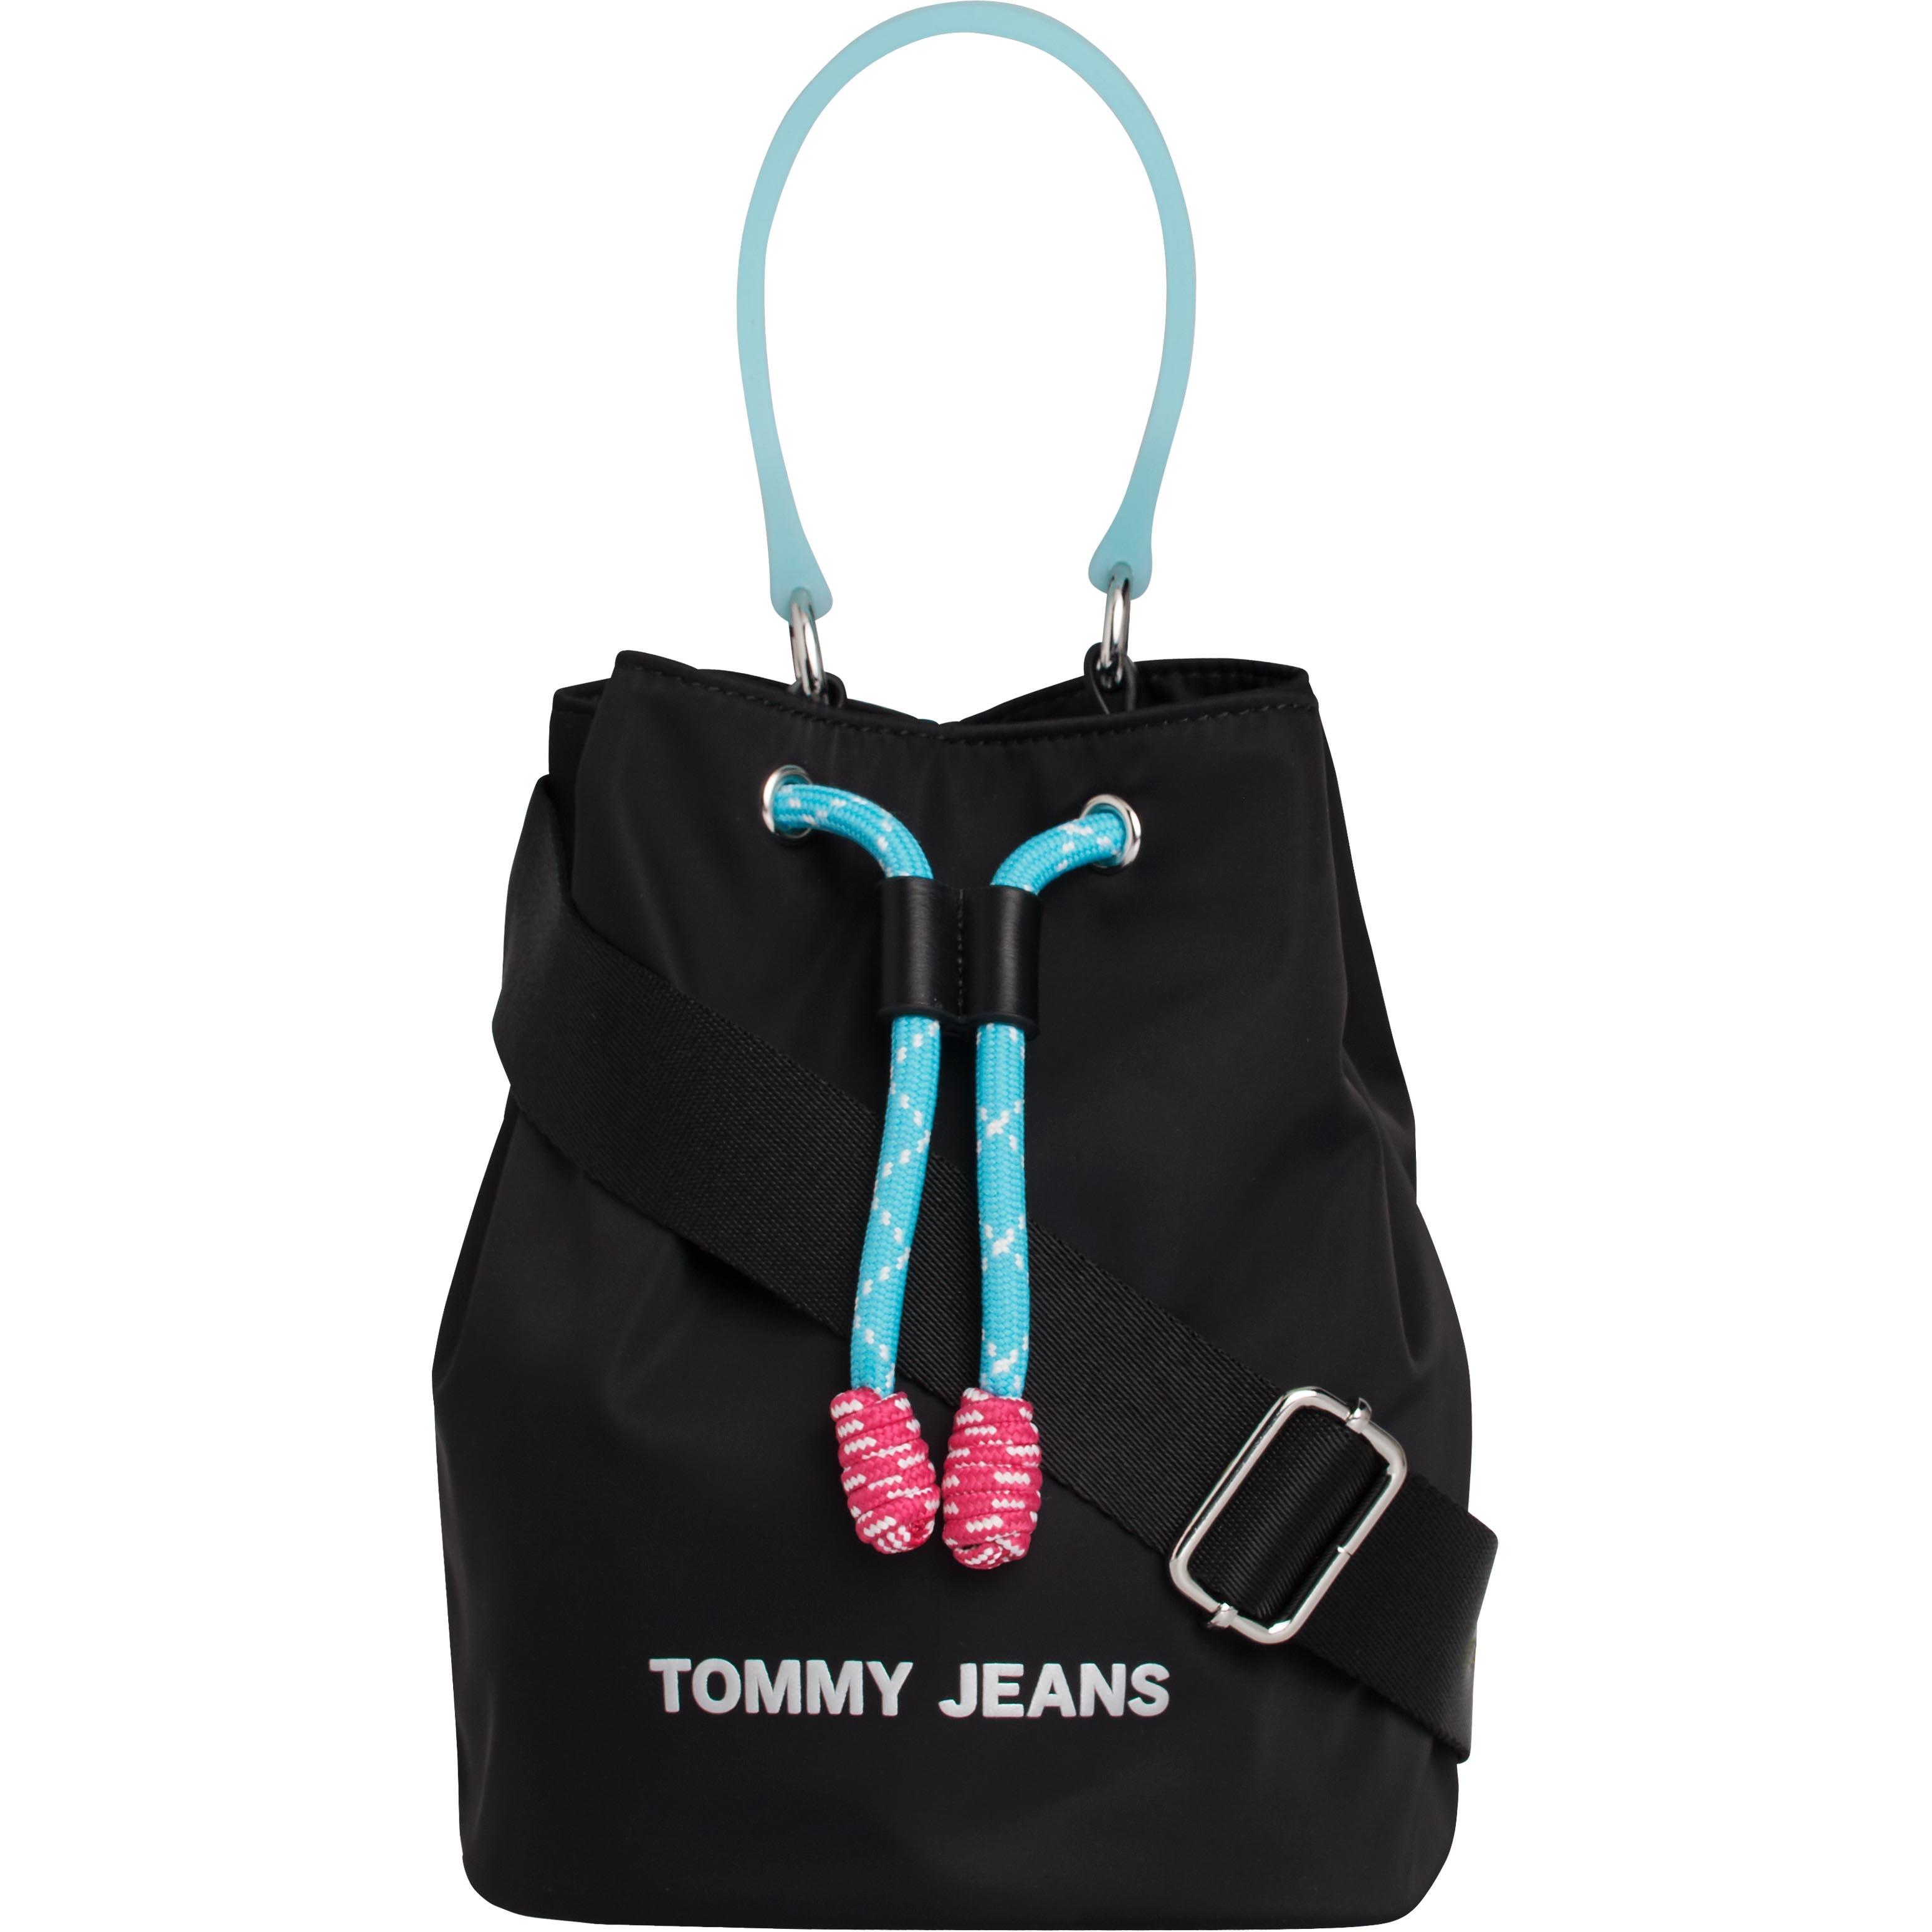 tommy jeans -  Mini Bag TJW NAUTICAL MIX SM BUCKET NYL